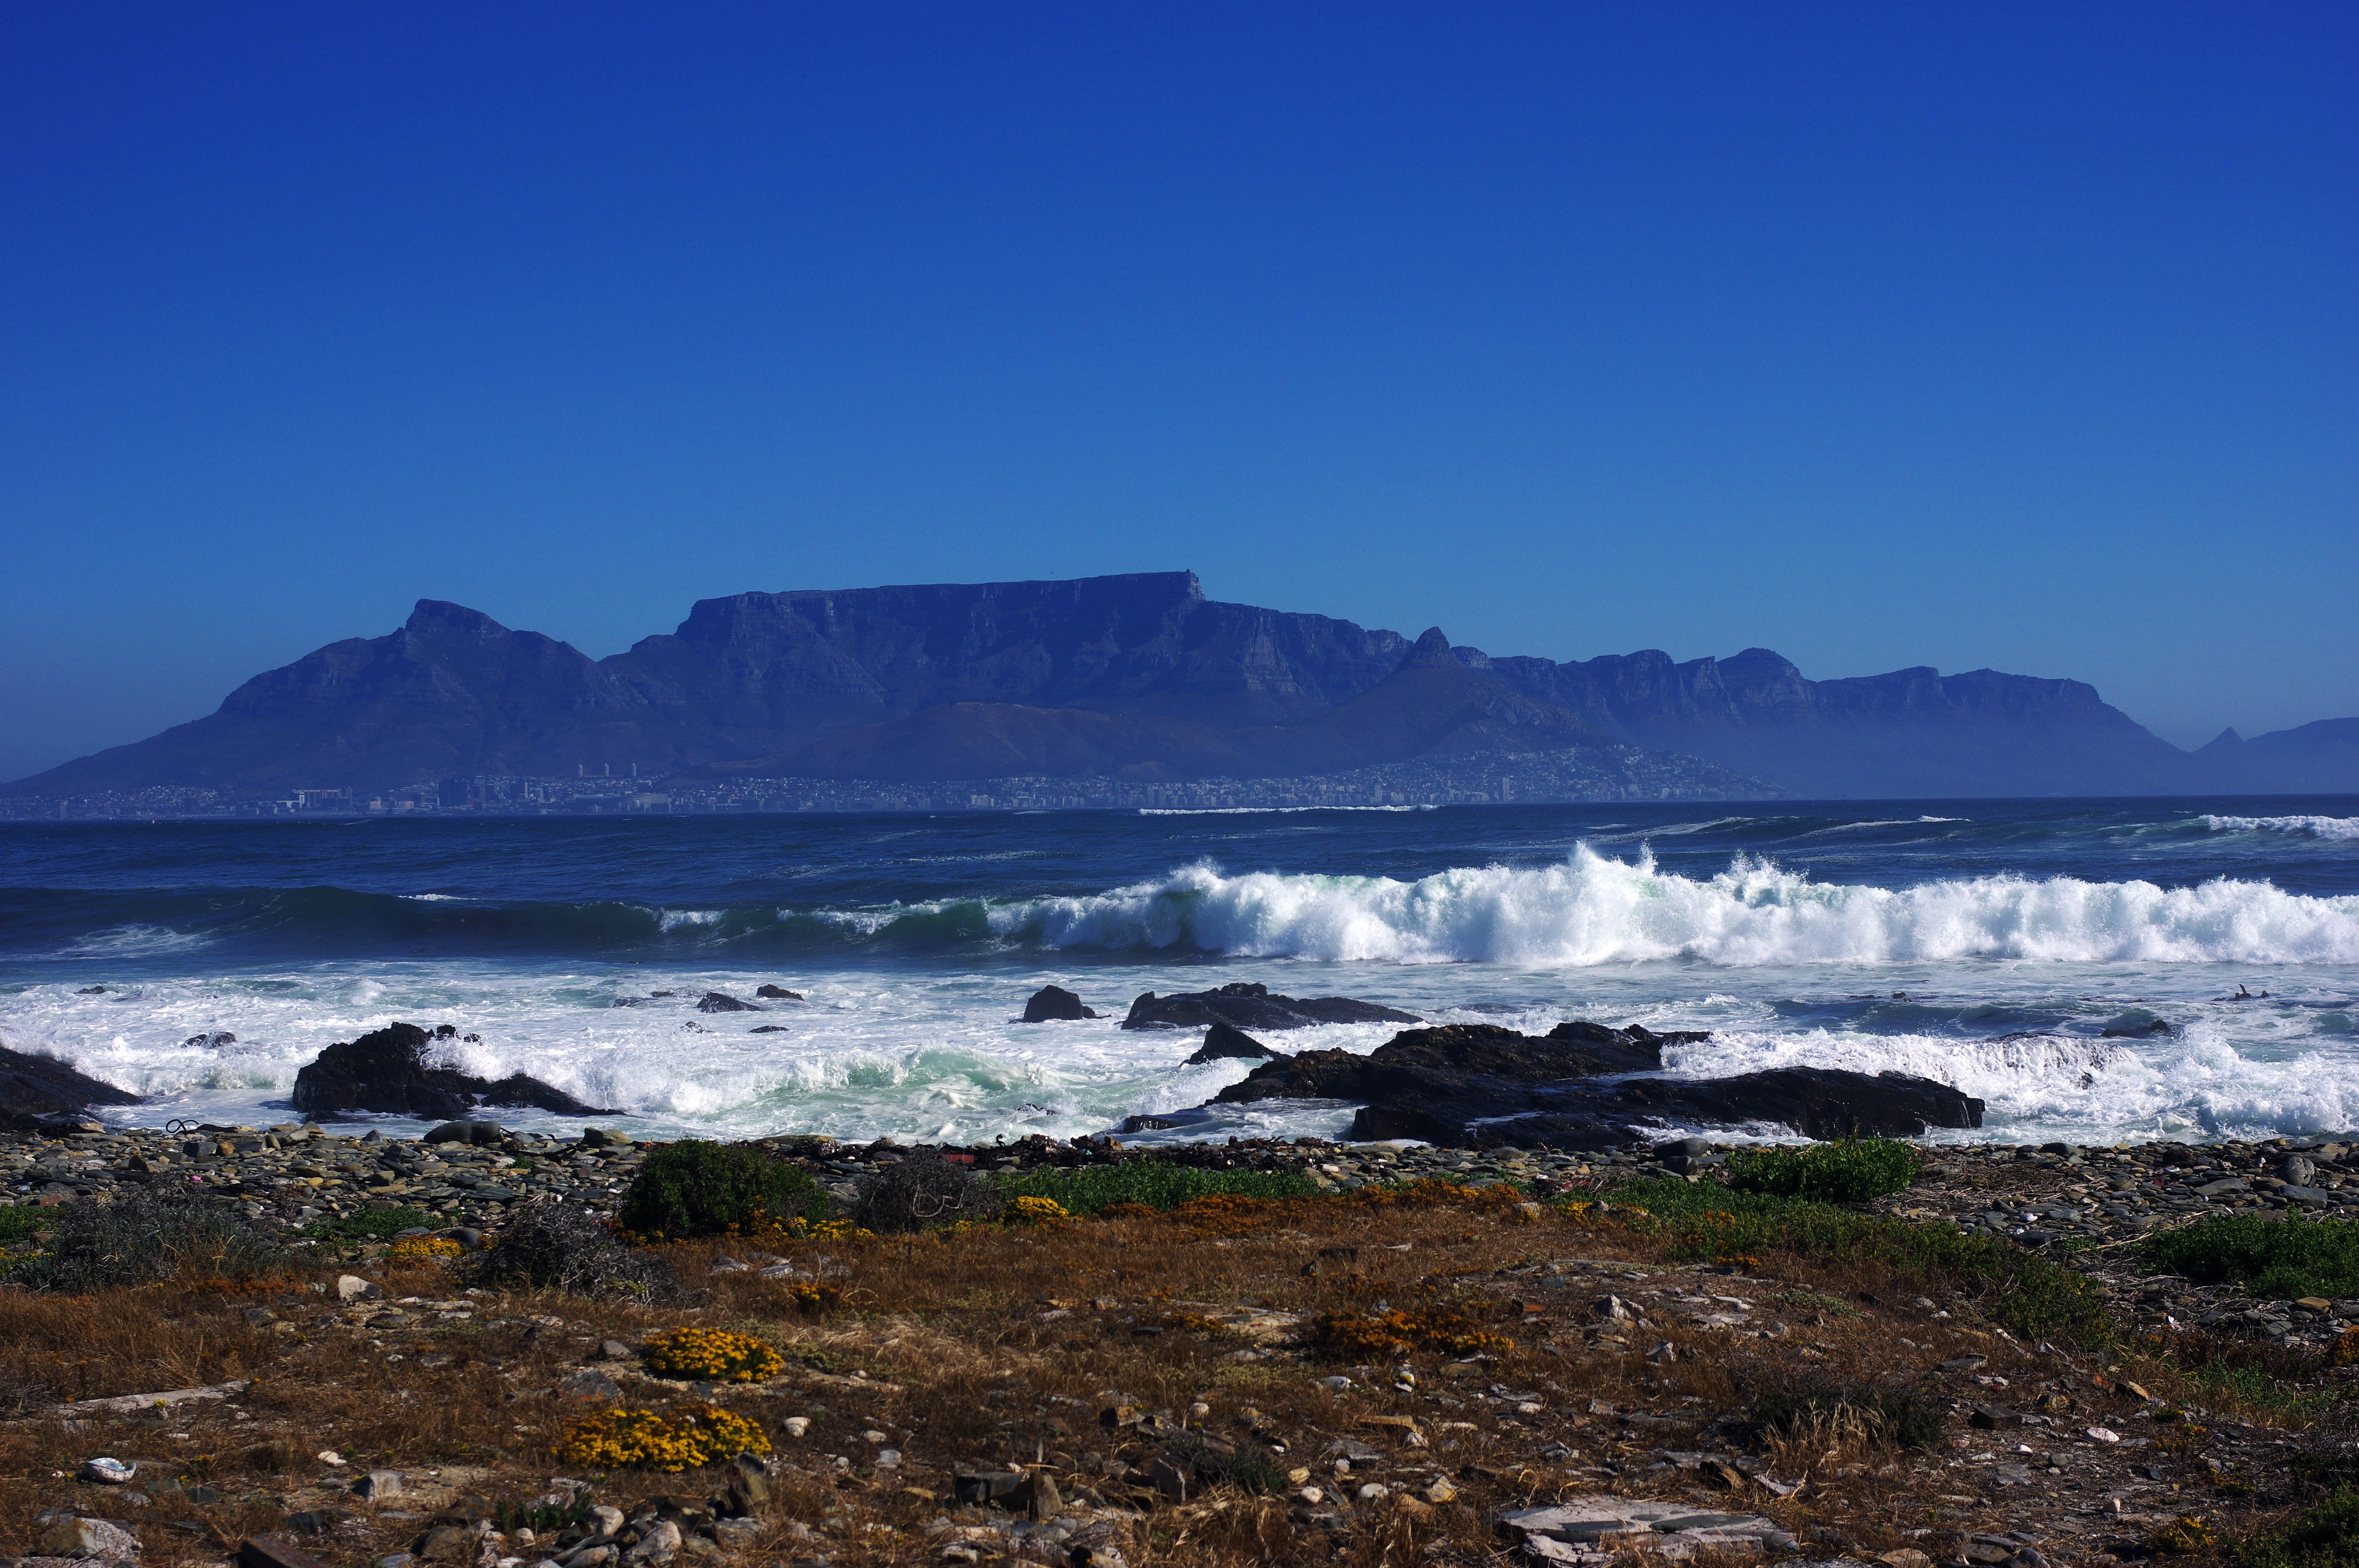 171122_CT_Robben island2